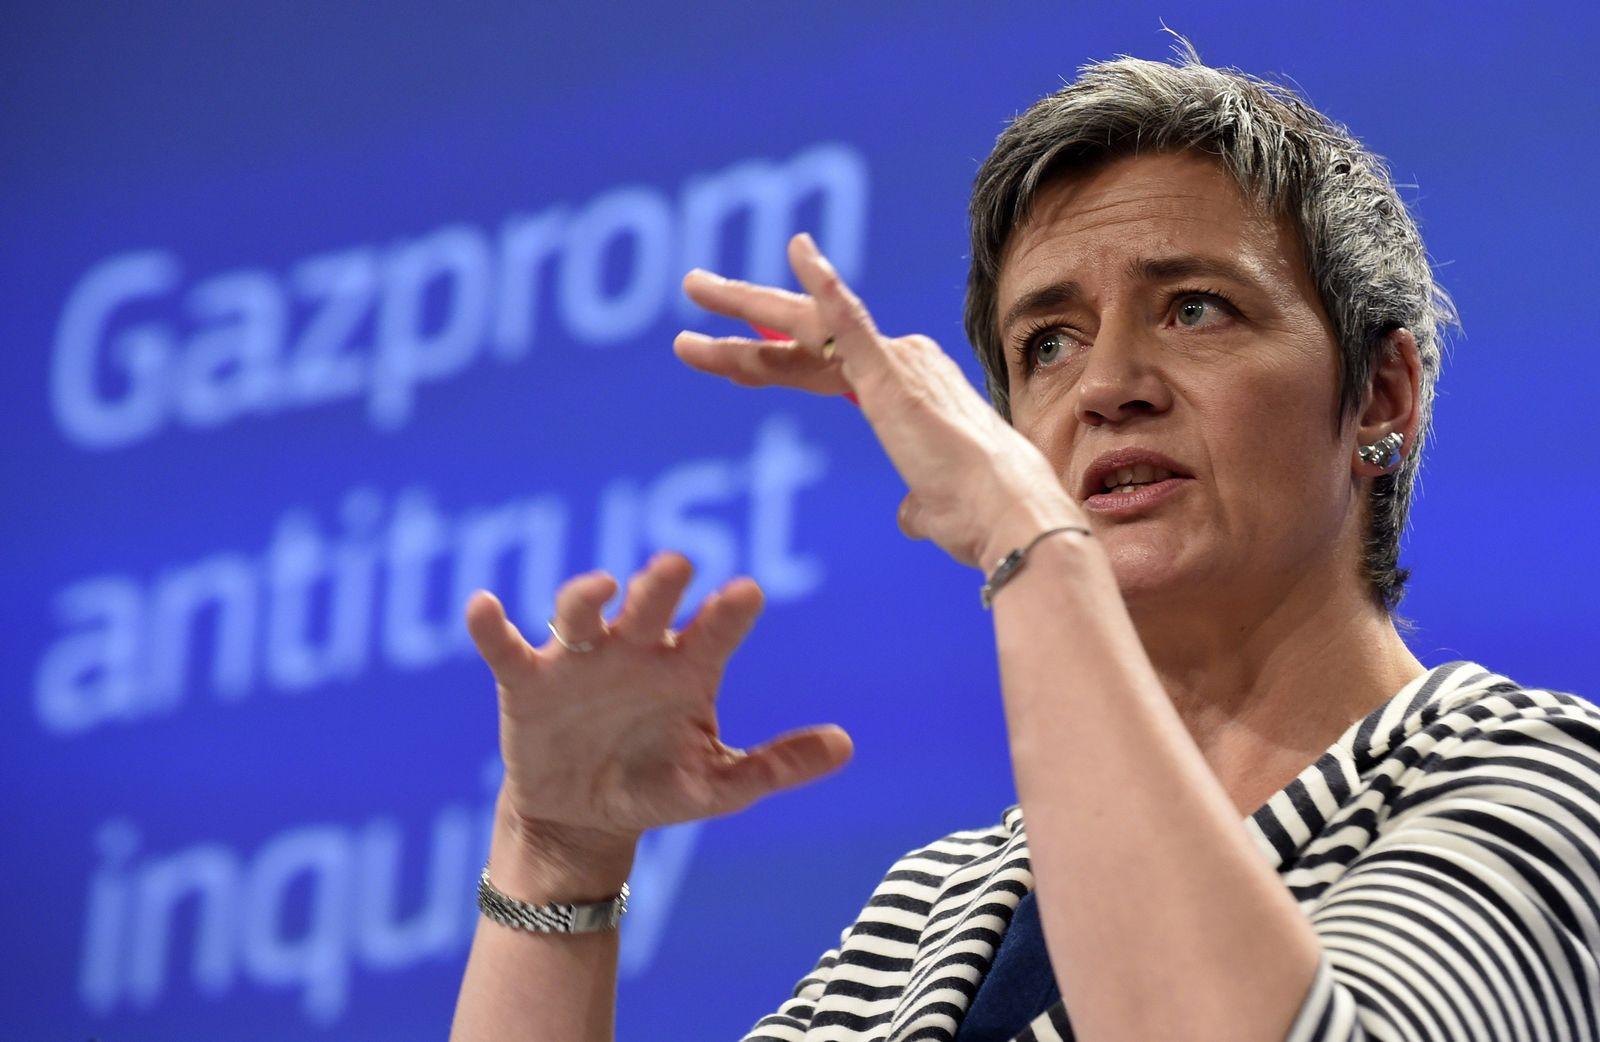 BELGIUM-EU-COMPETITION-GAZPROM